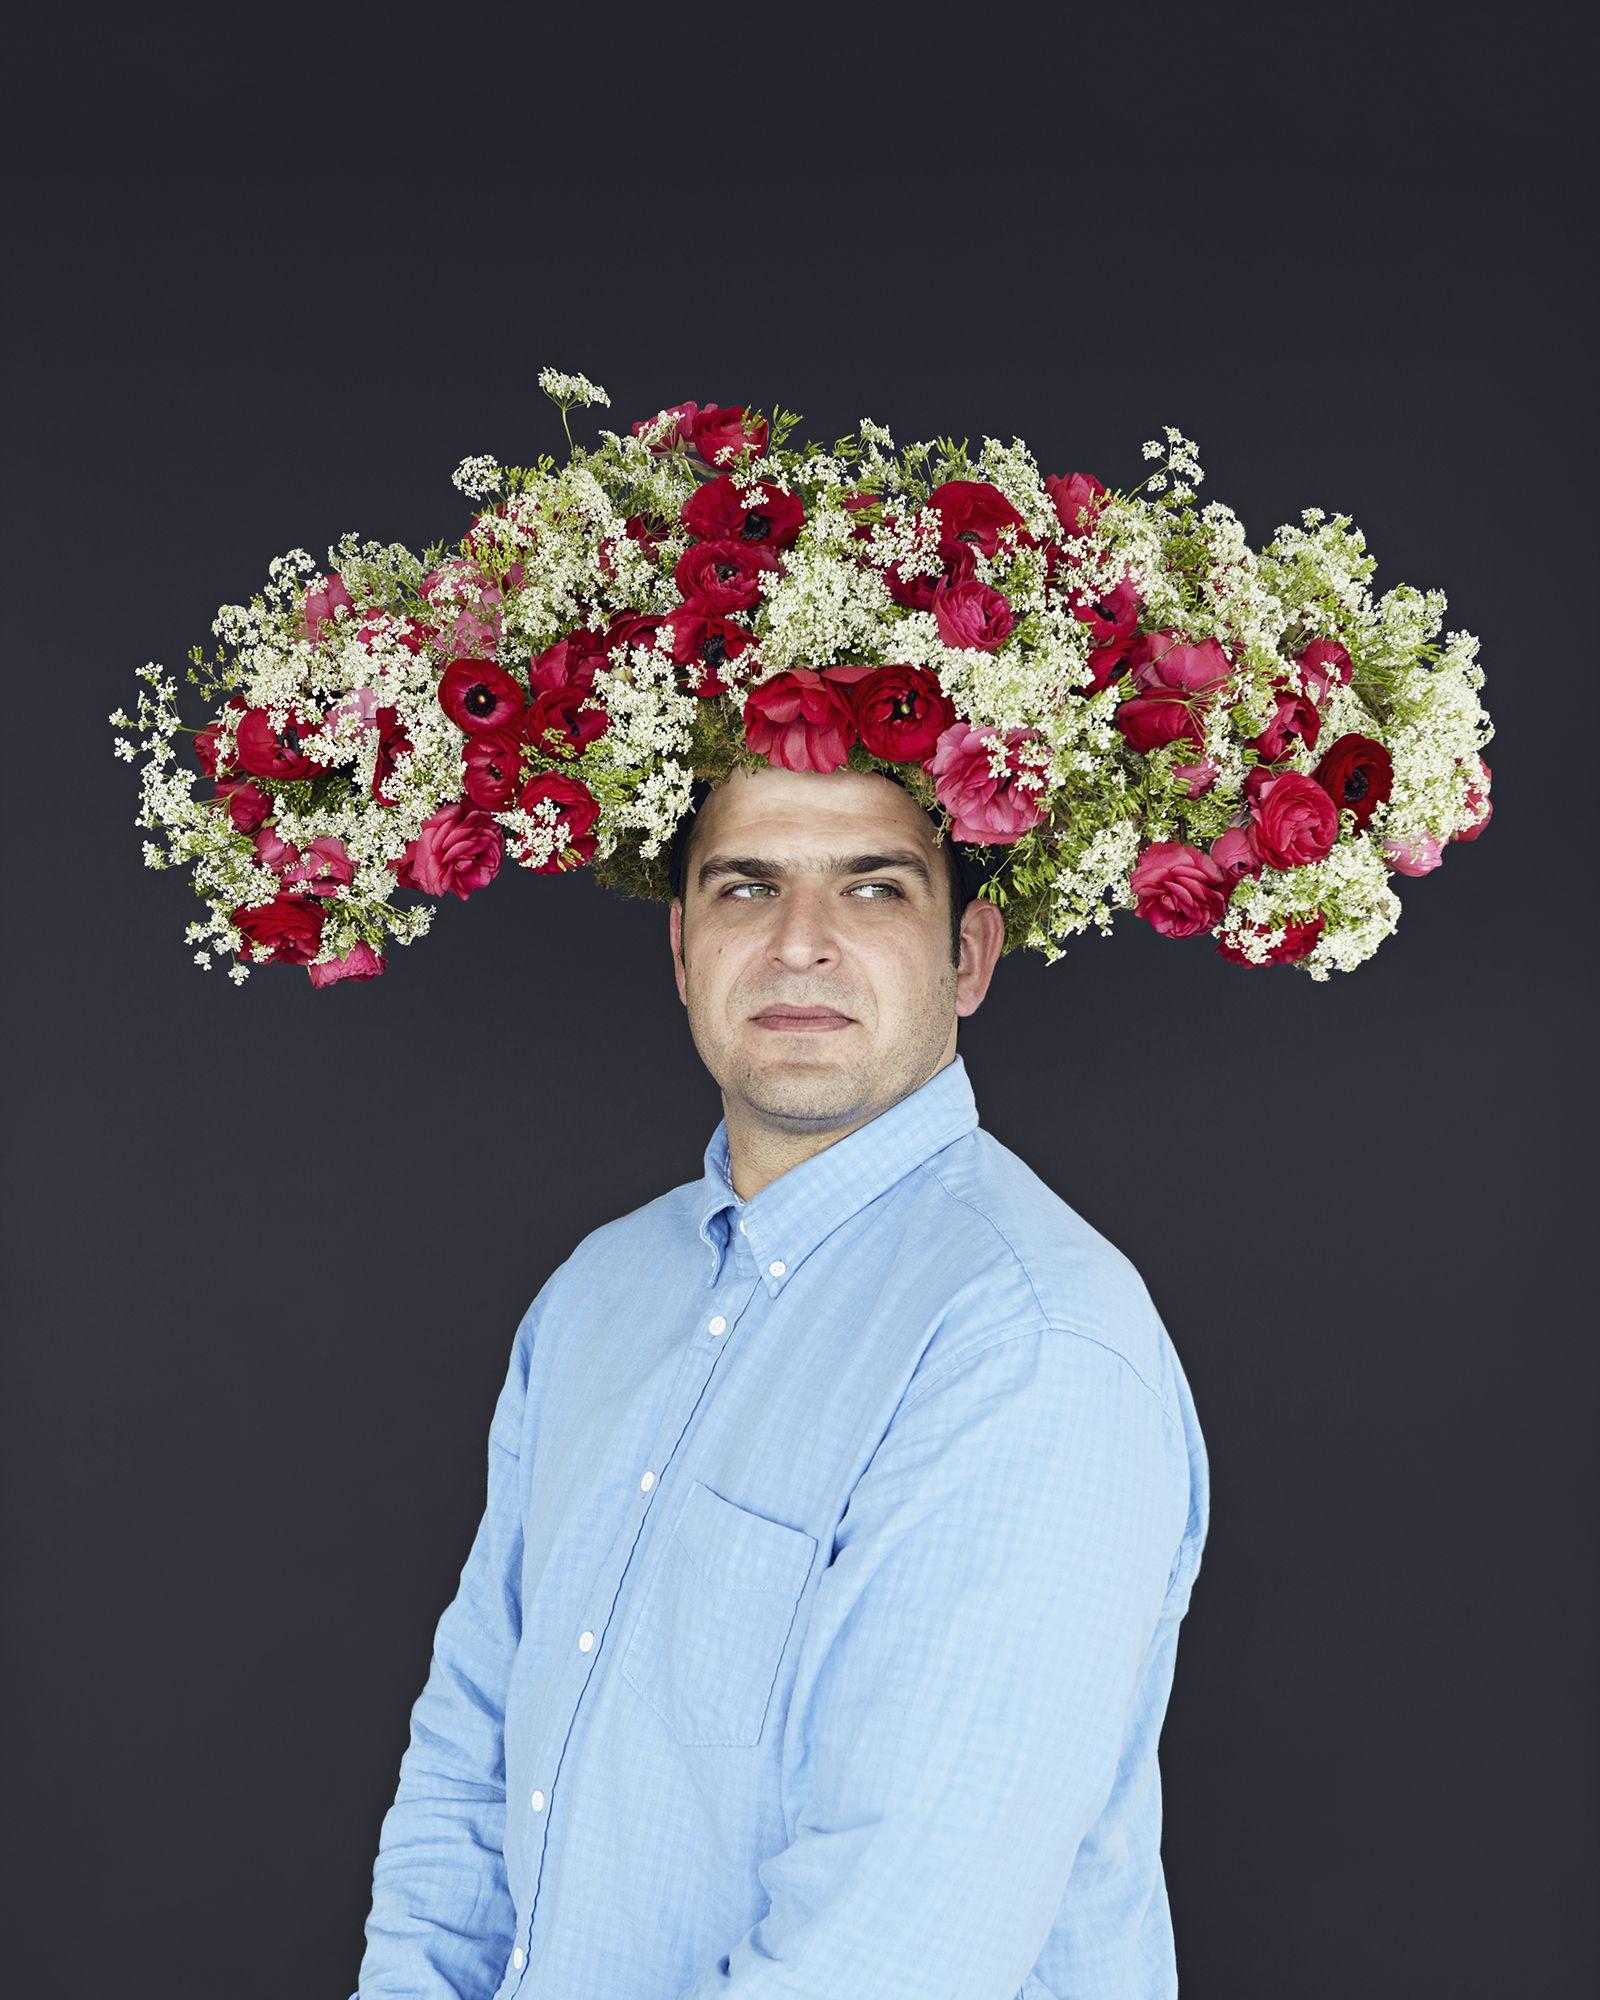 Huge flower crown gallery flower wallpaper hd huge flower crown gallery flower wallpaper hd huge flower crown images flower wallpaper hd mr may izmirmasajfo